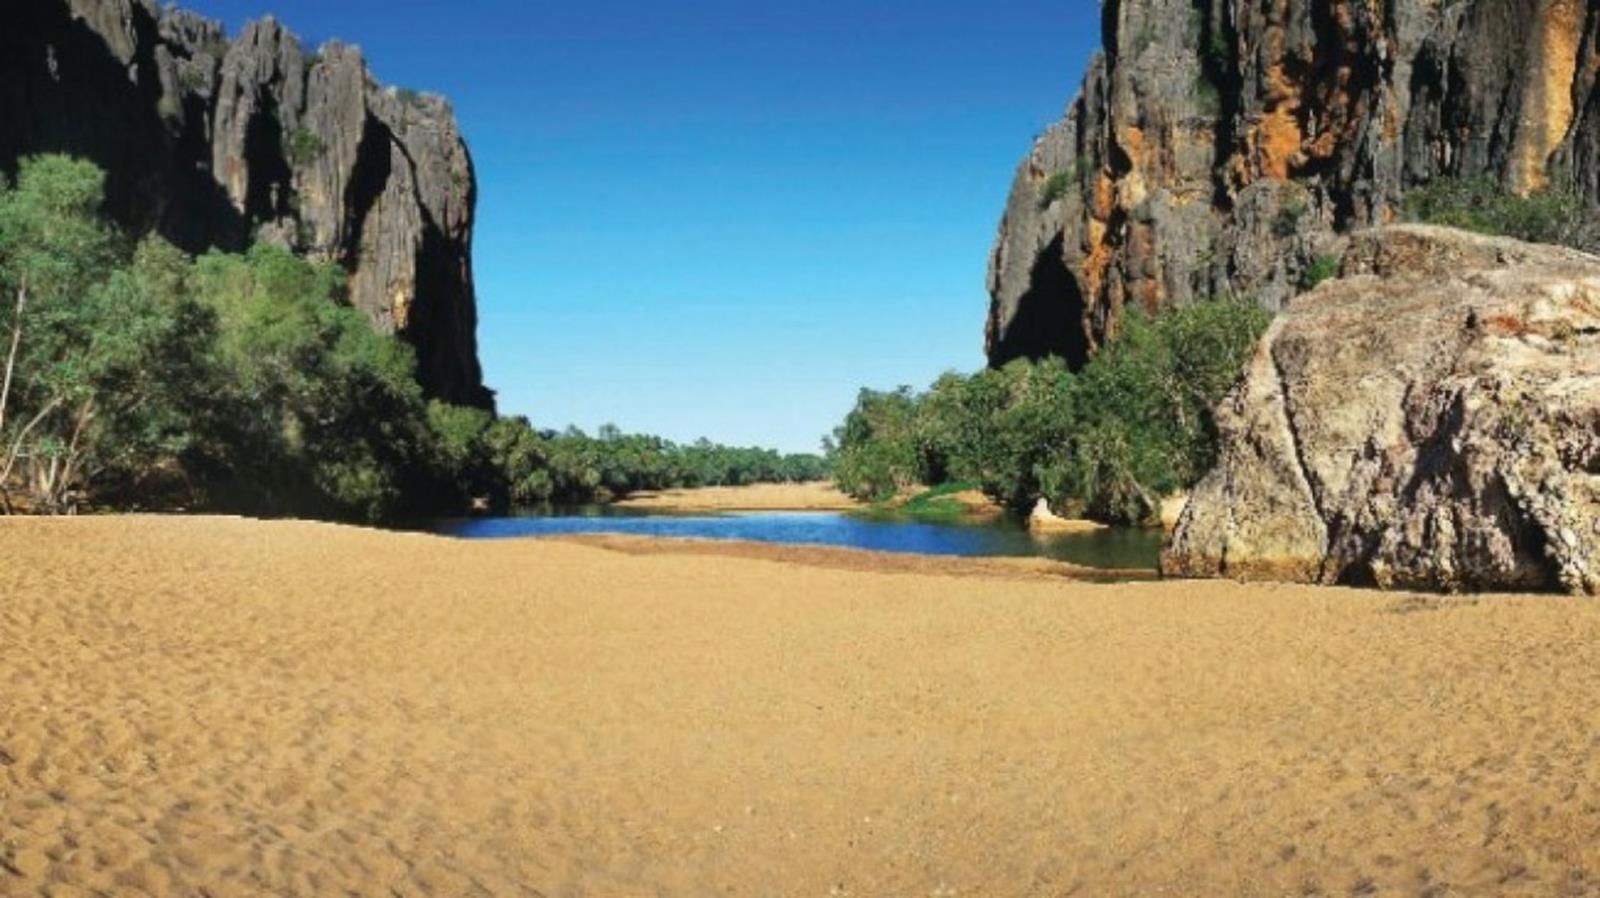 Credit http://www.australia.com/content/australia/en/itineraries/wa-gibb-river-rd/jcr:content/hero/image.adapt.1663.medium.jpg